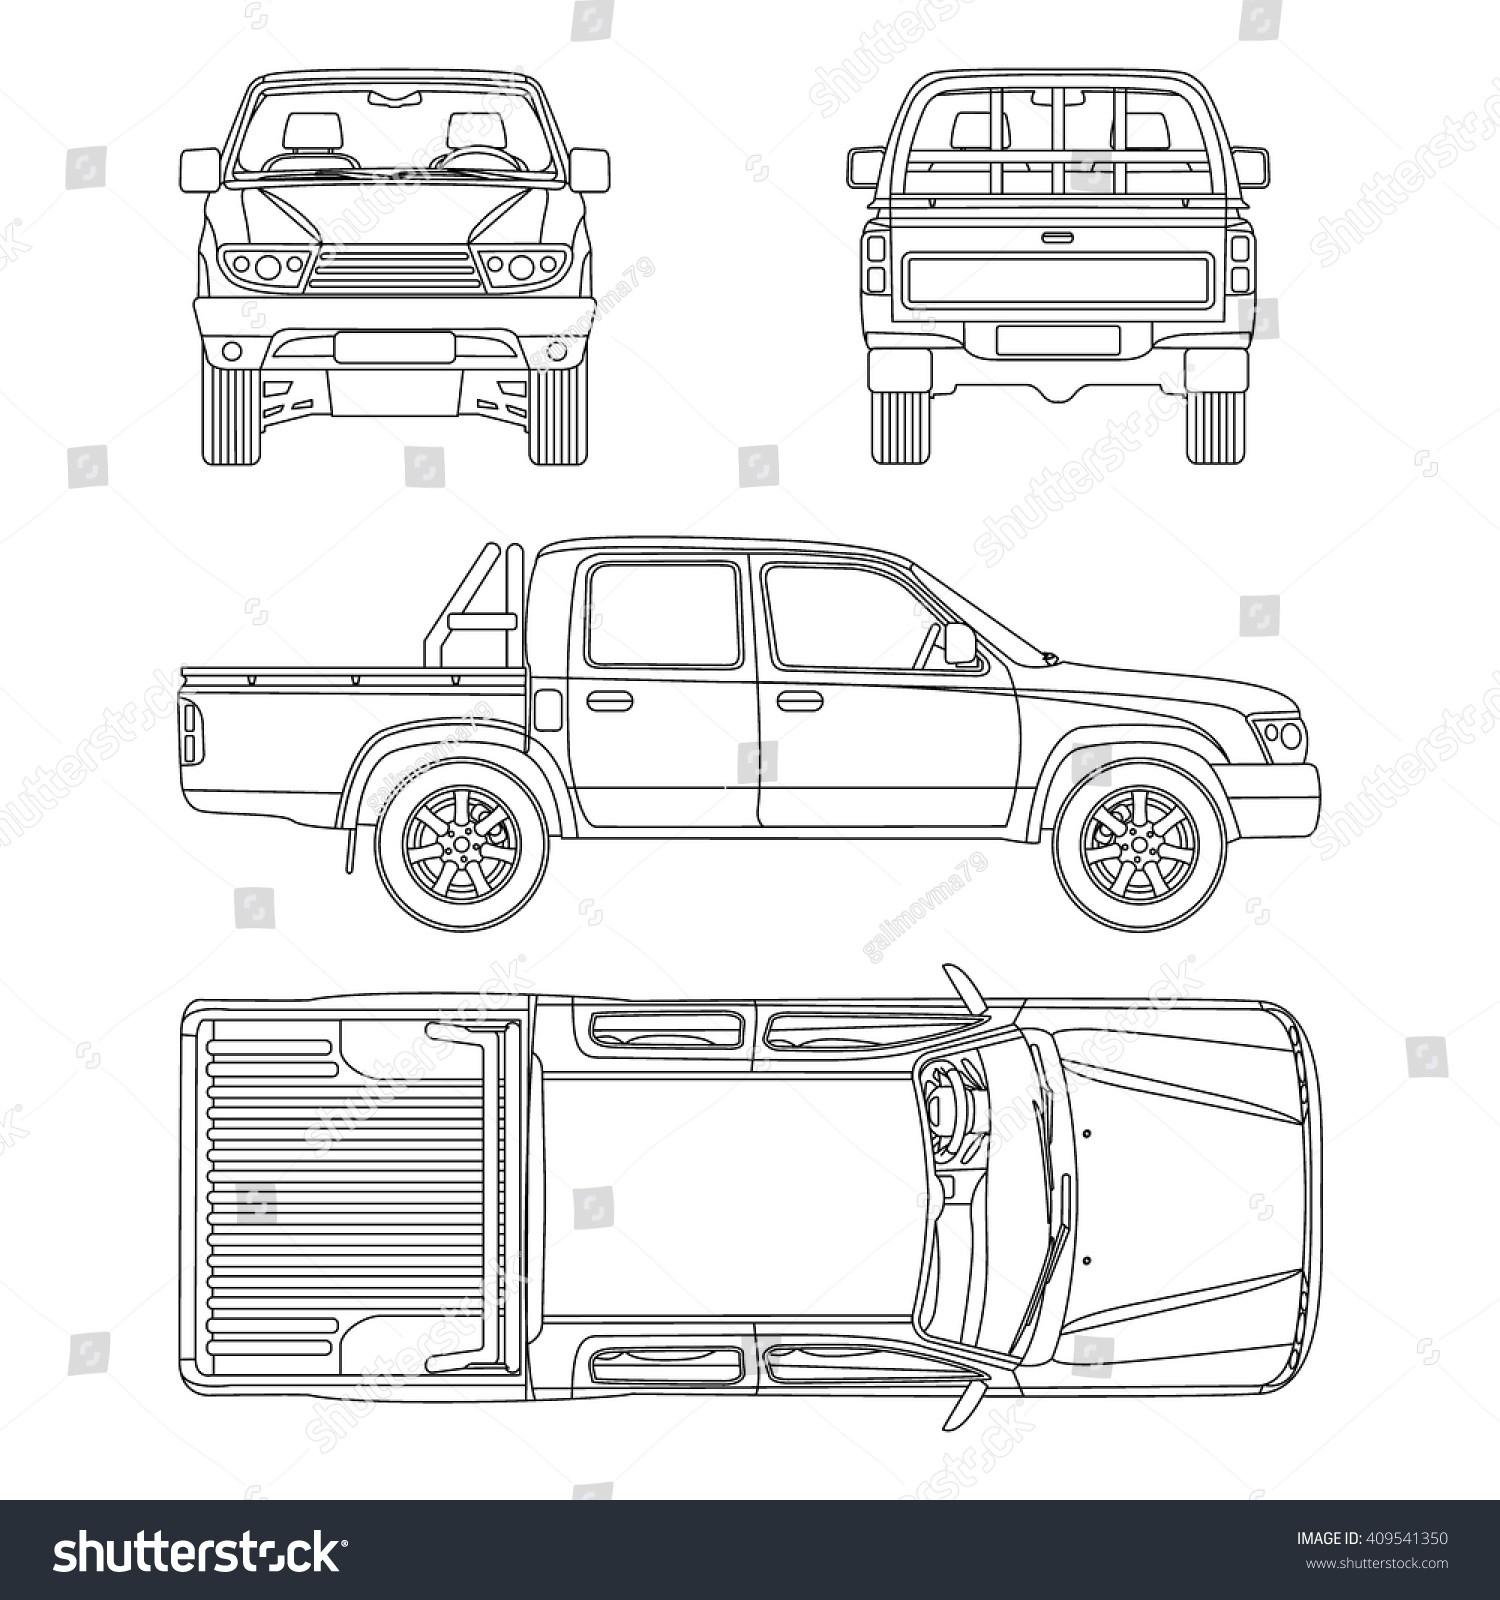 Vehicle Damage Diagram Template Free Vehicle Wiring Diagrams